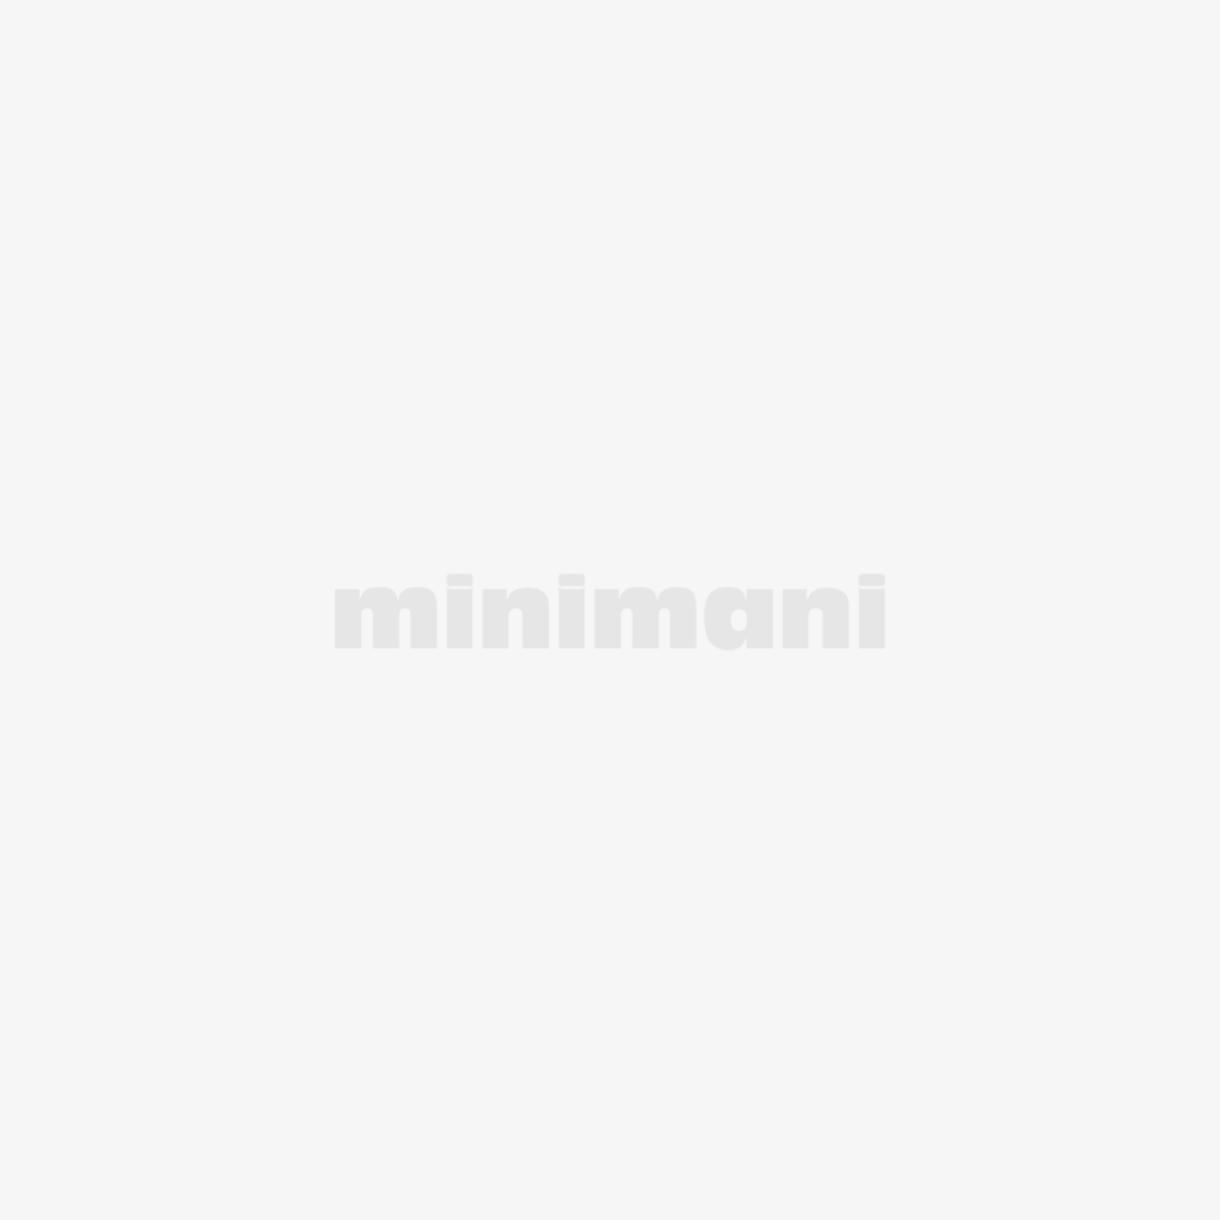 MOCCAMASTER SUODATINSUPPILO MALLEIHIN H,K,K743 MUSTA